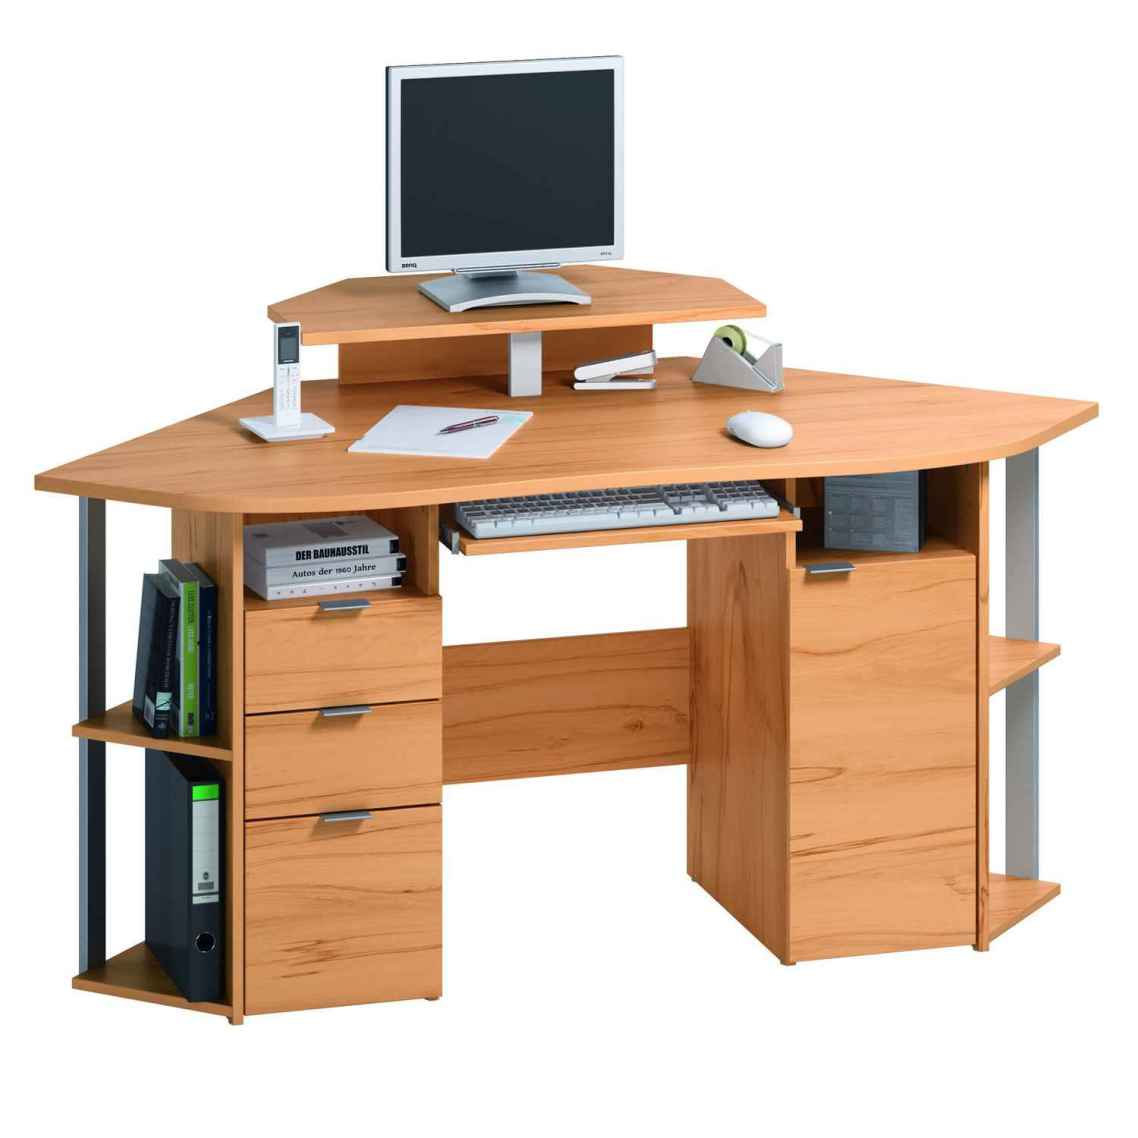 small corner desk with drawers decor ideasdecor ideas. Black Bedroom Furniture Sets. Home Design Ideas